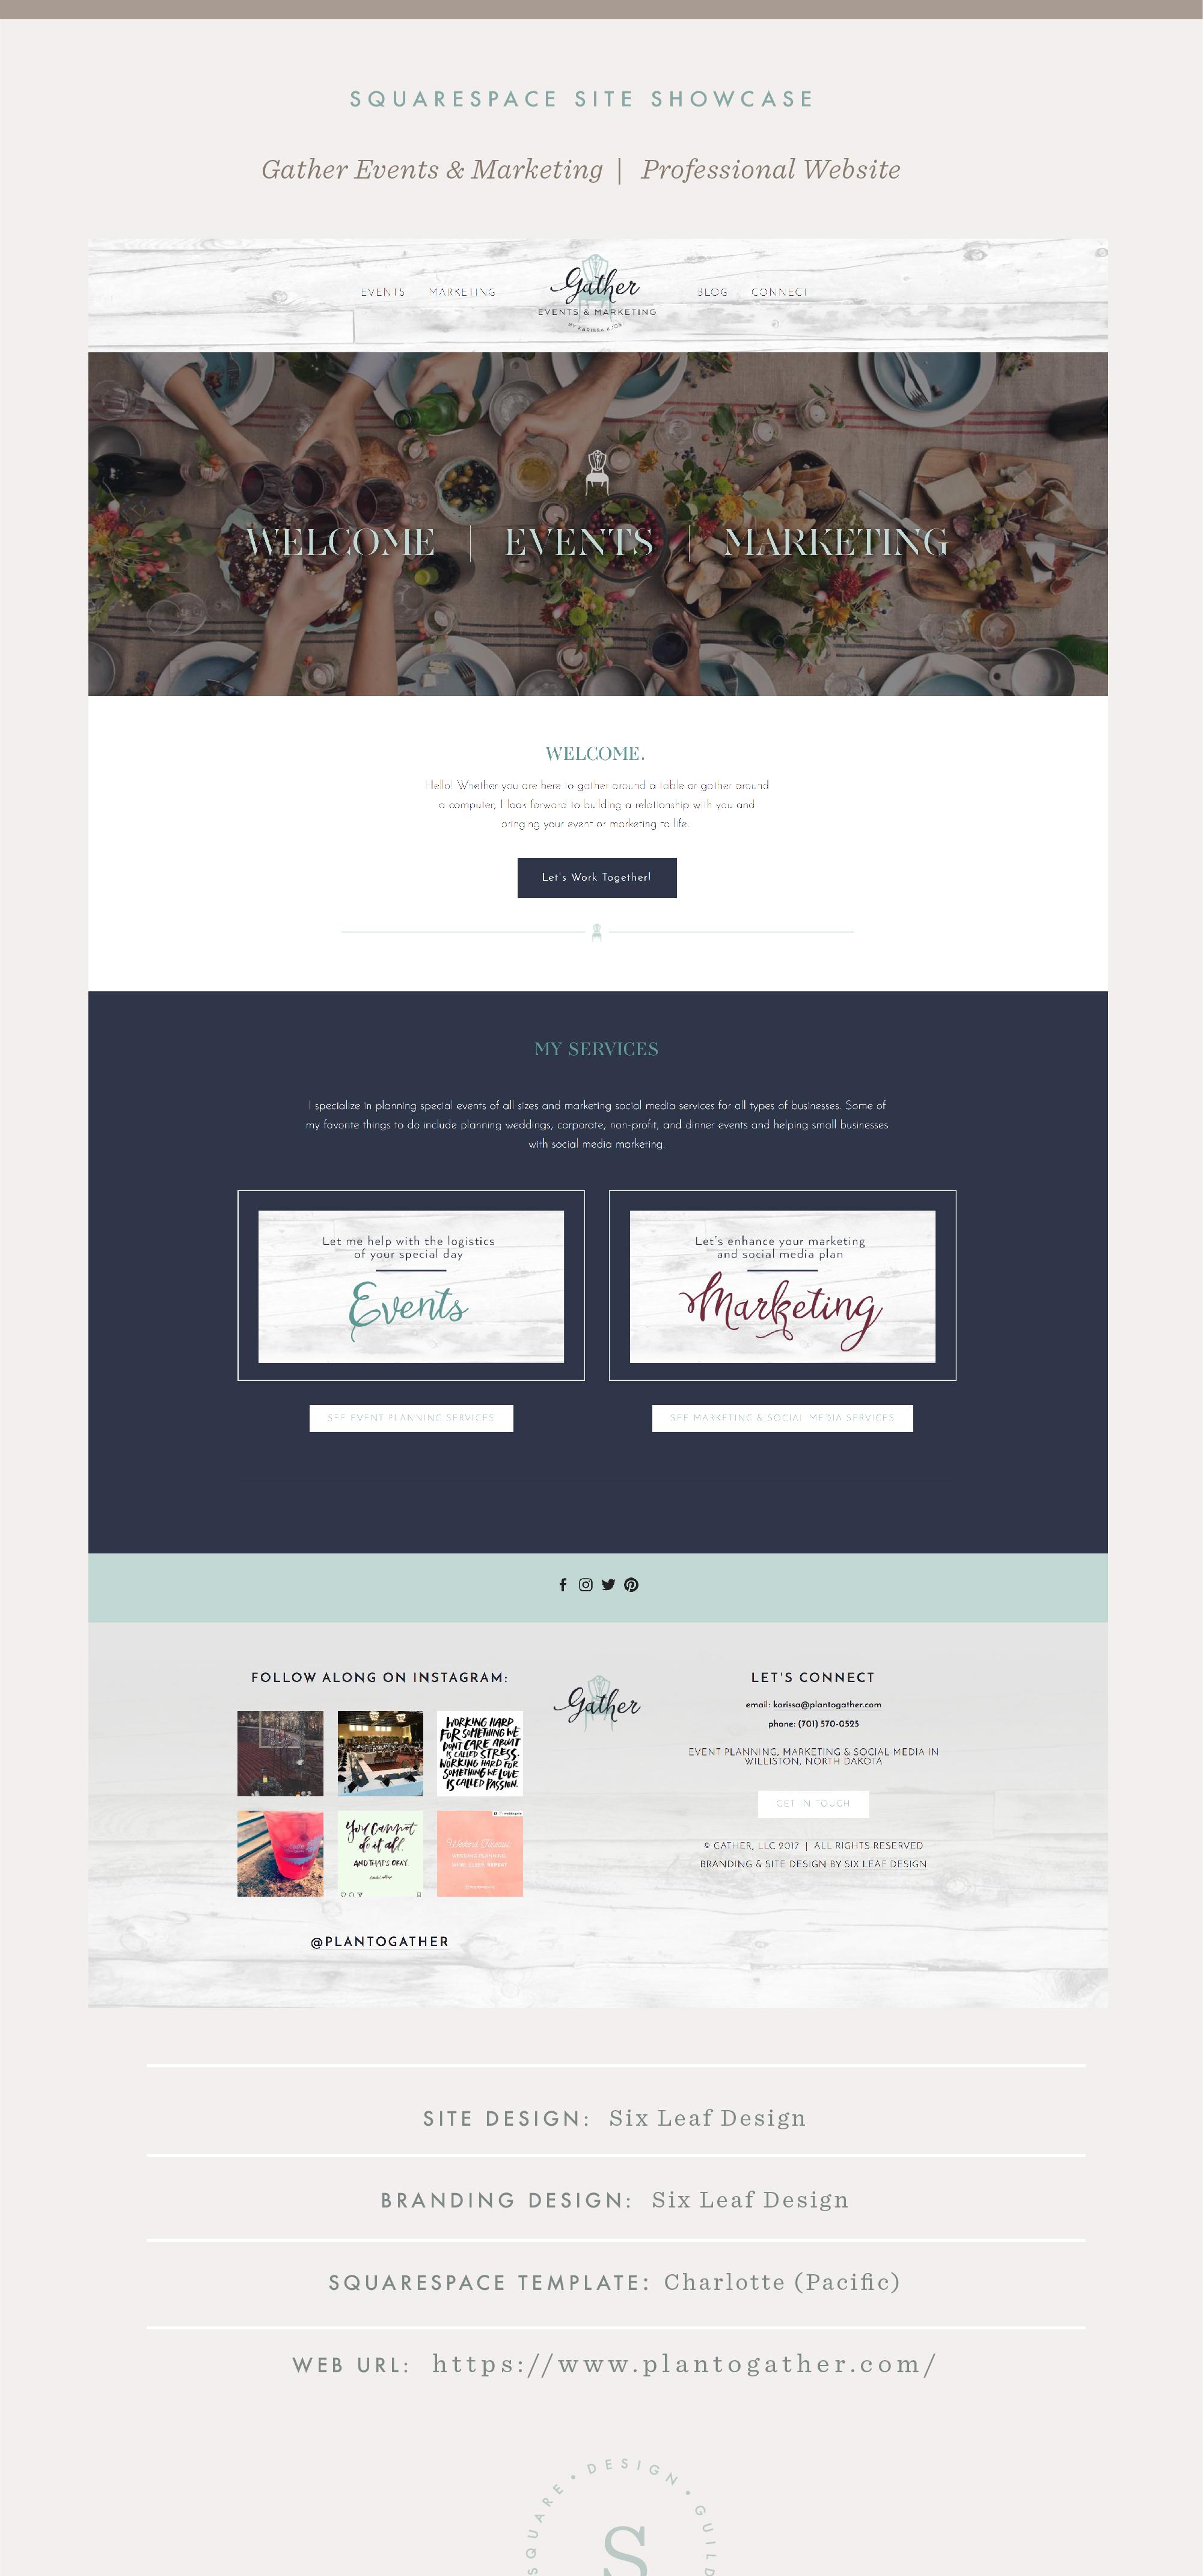 Squarespace Site Showcase | Gather Events & Marketing| Pacific Template | Six Leaf Design